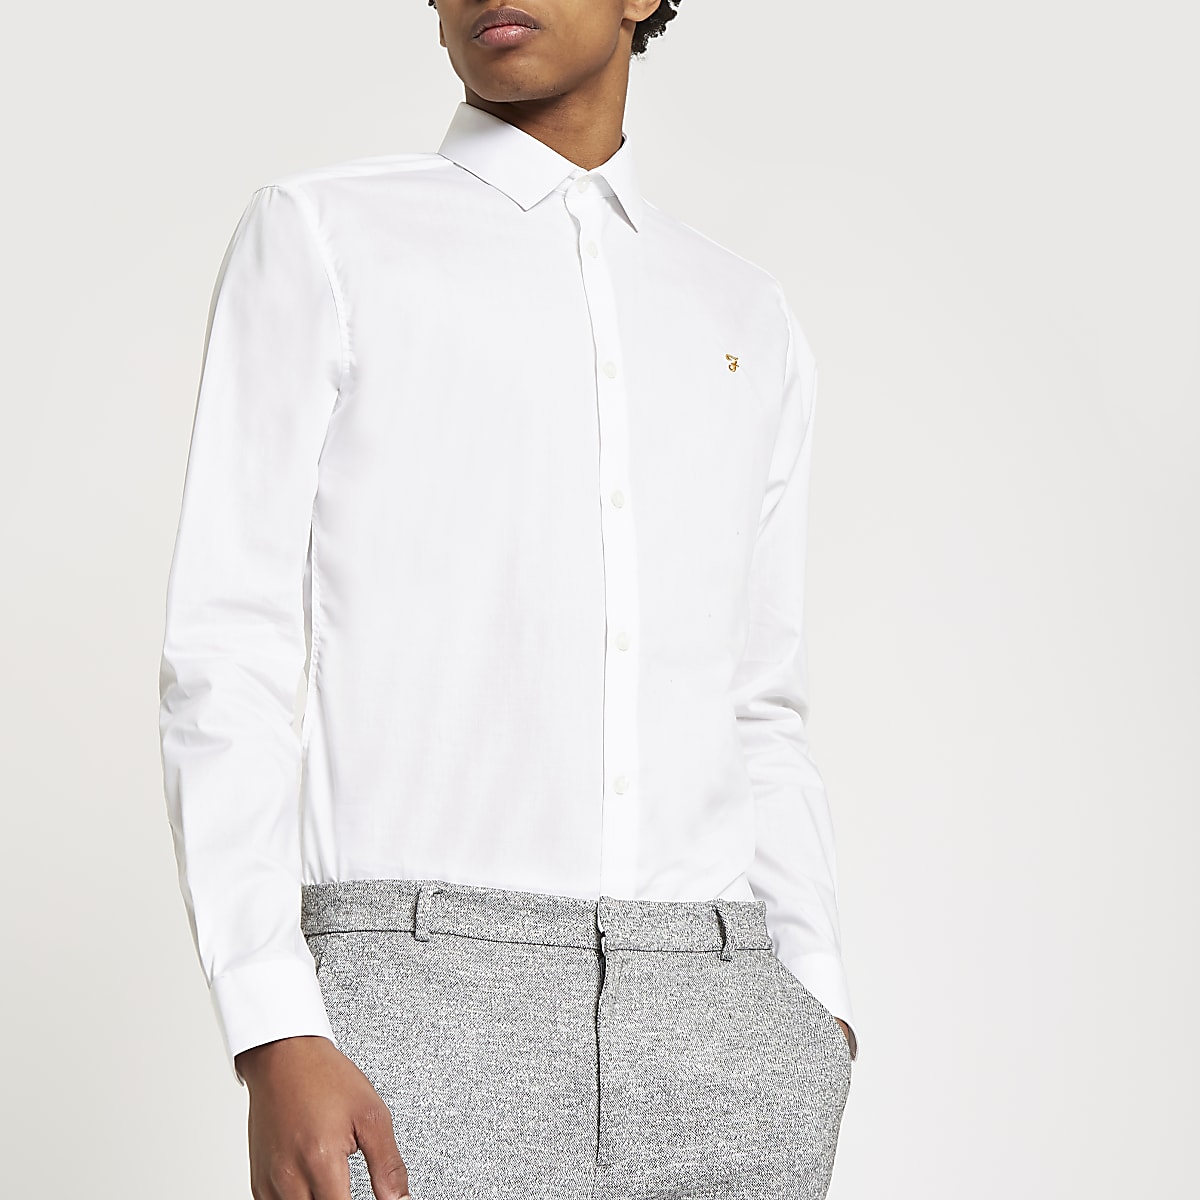 Farah - Wit overhemd met lange mouwen